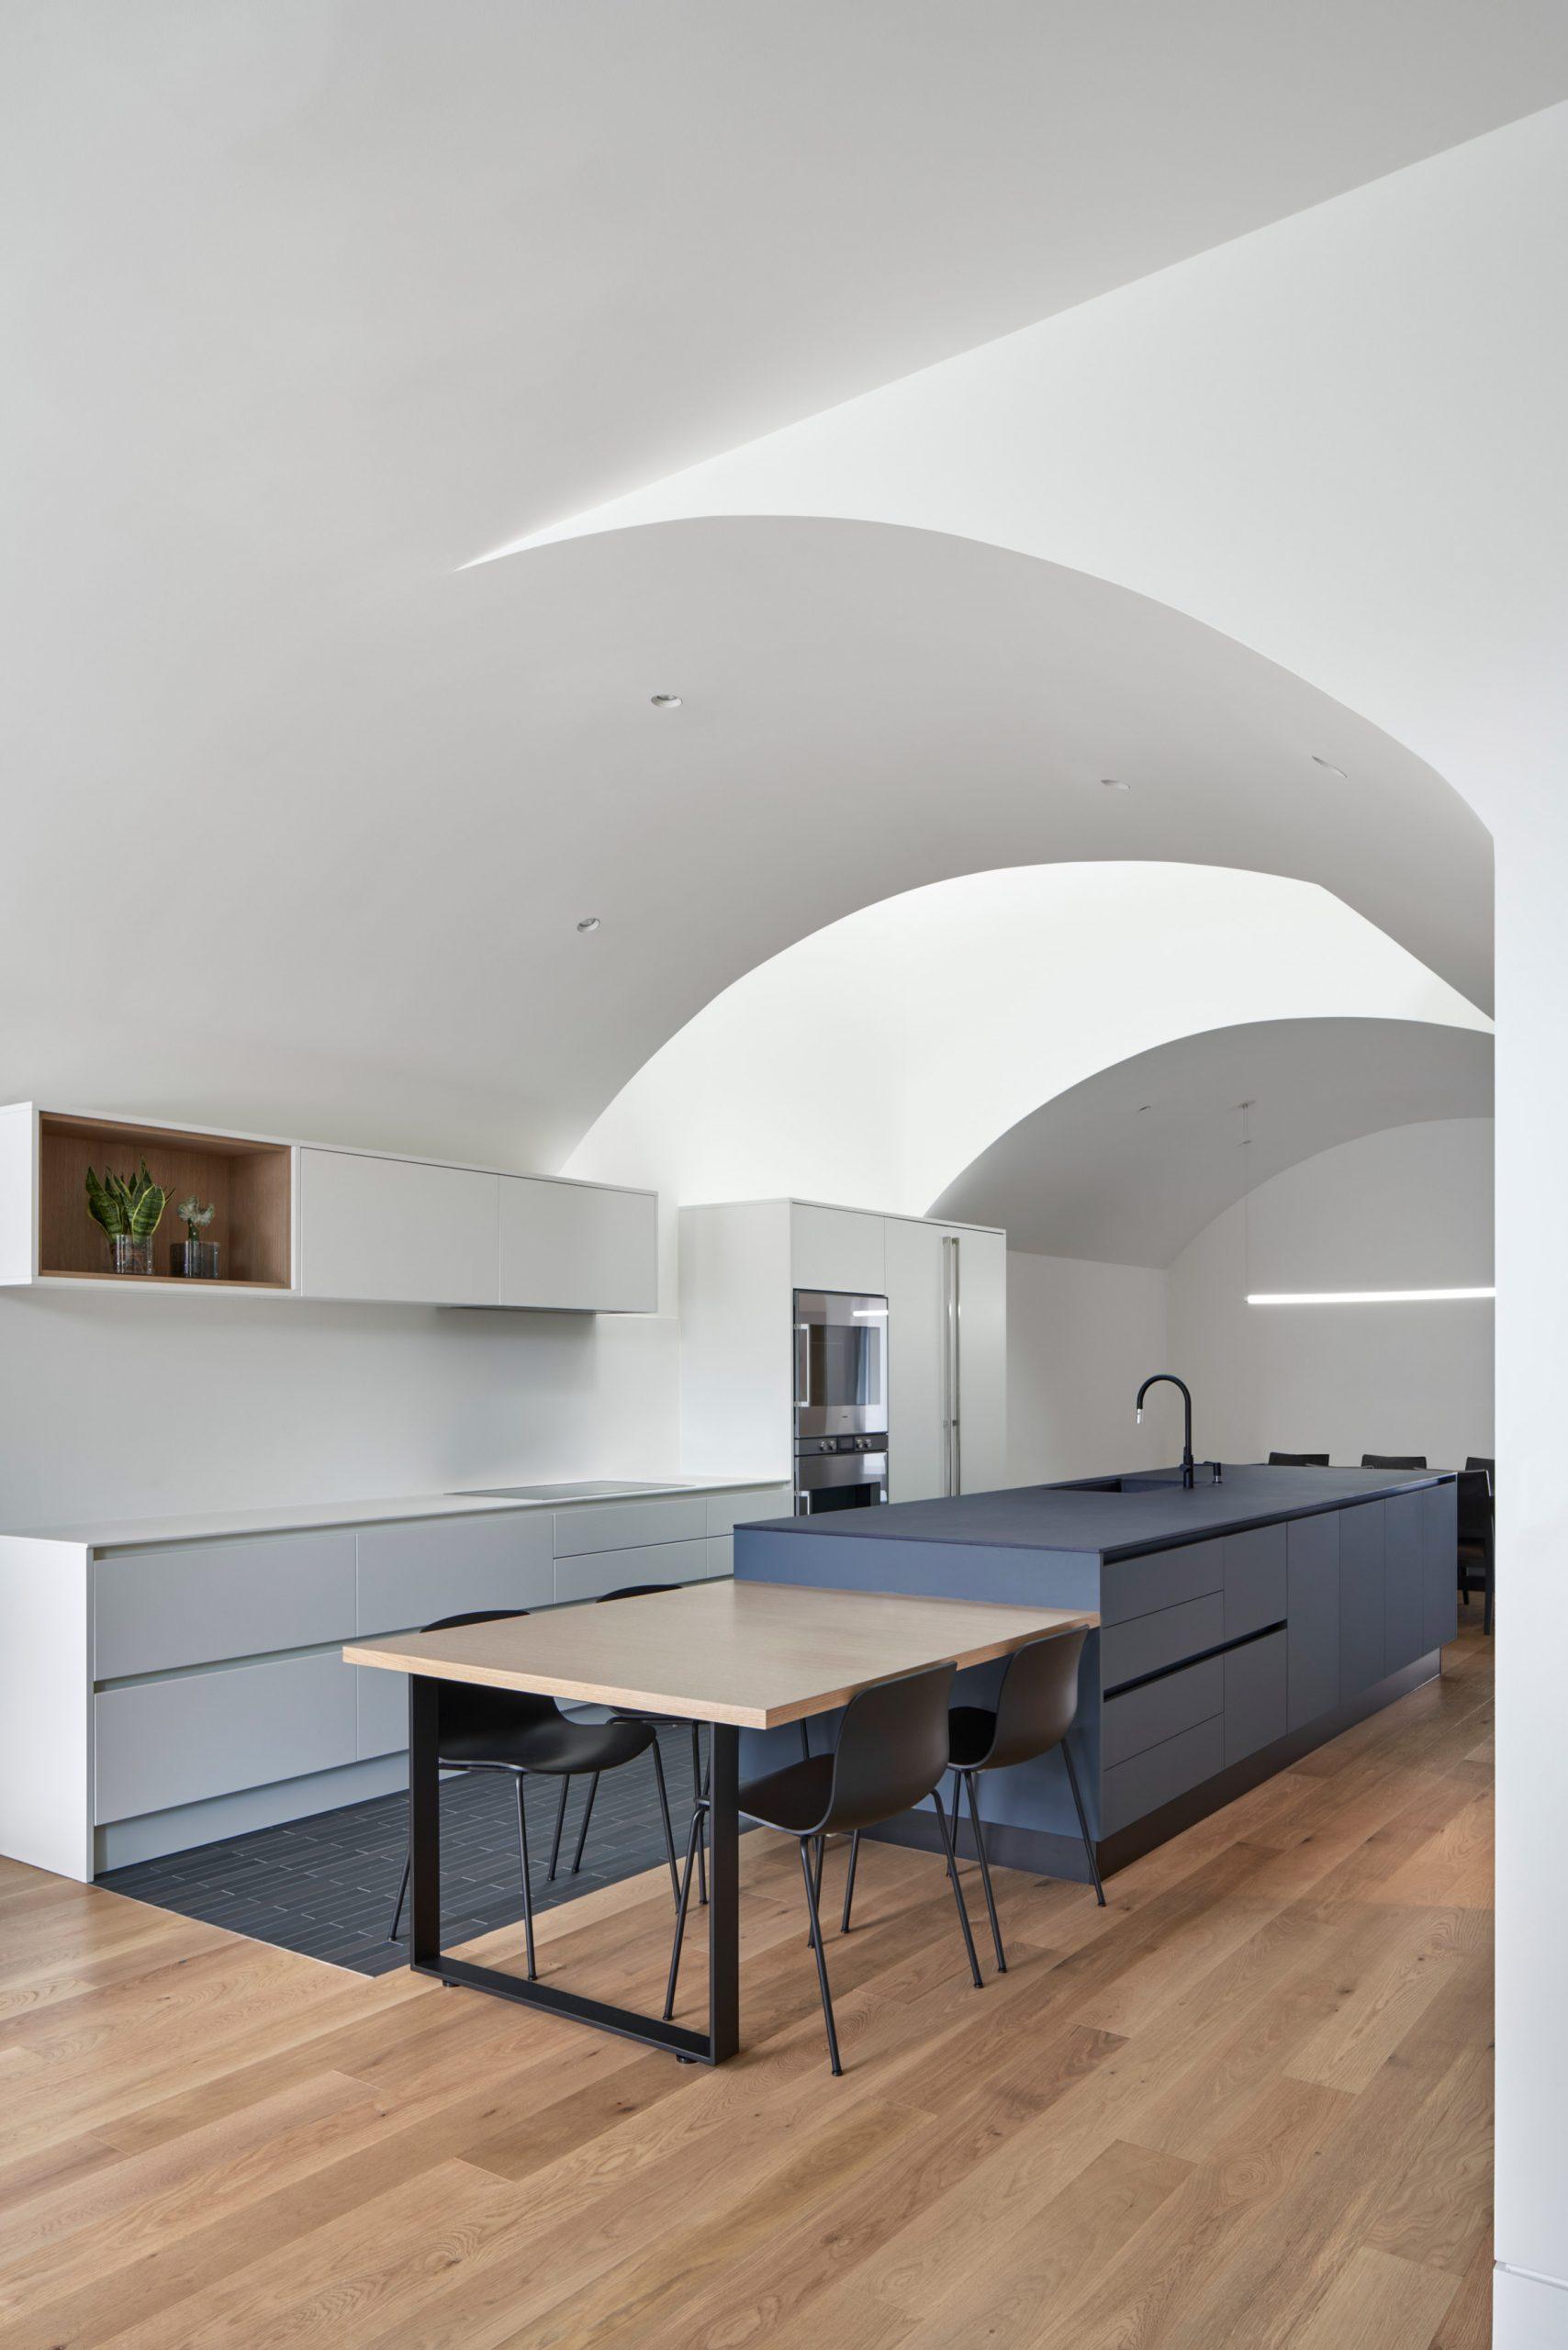 Batay-Csorba Architects designed the house